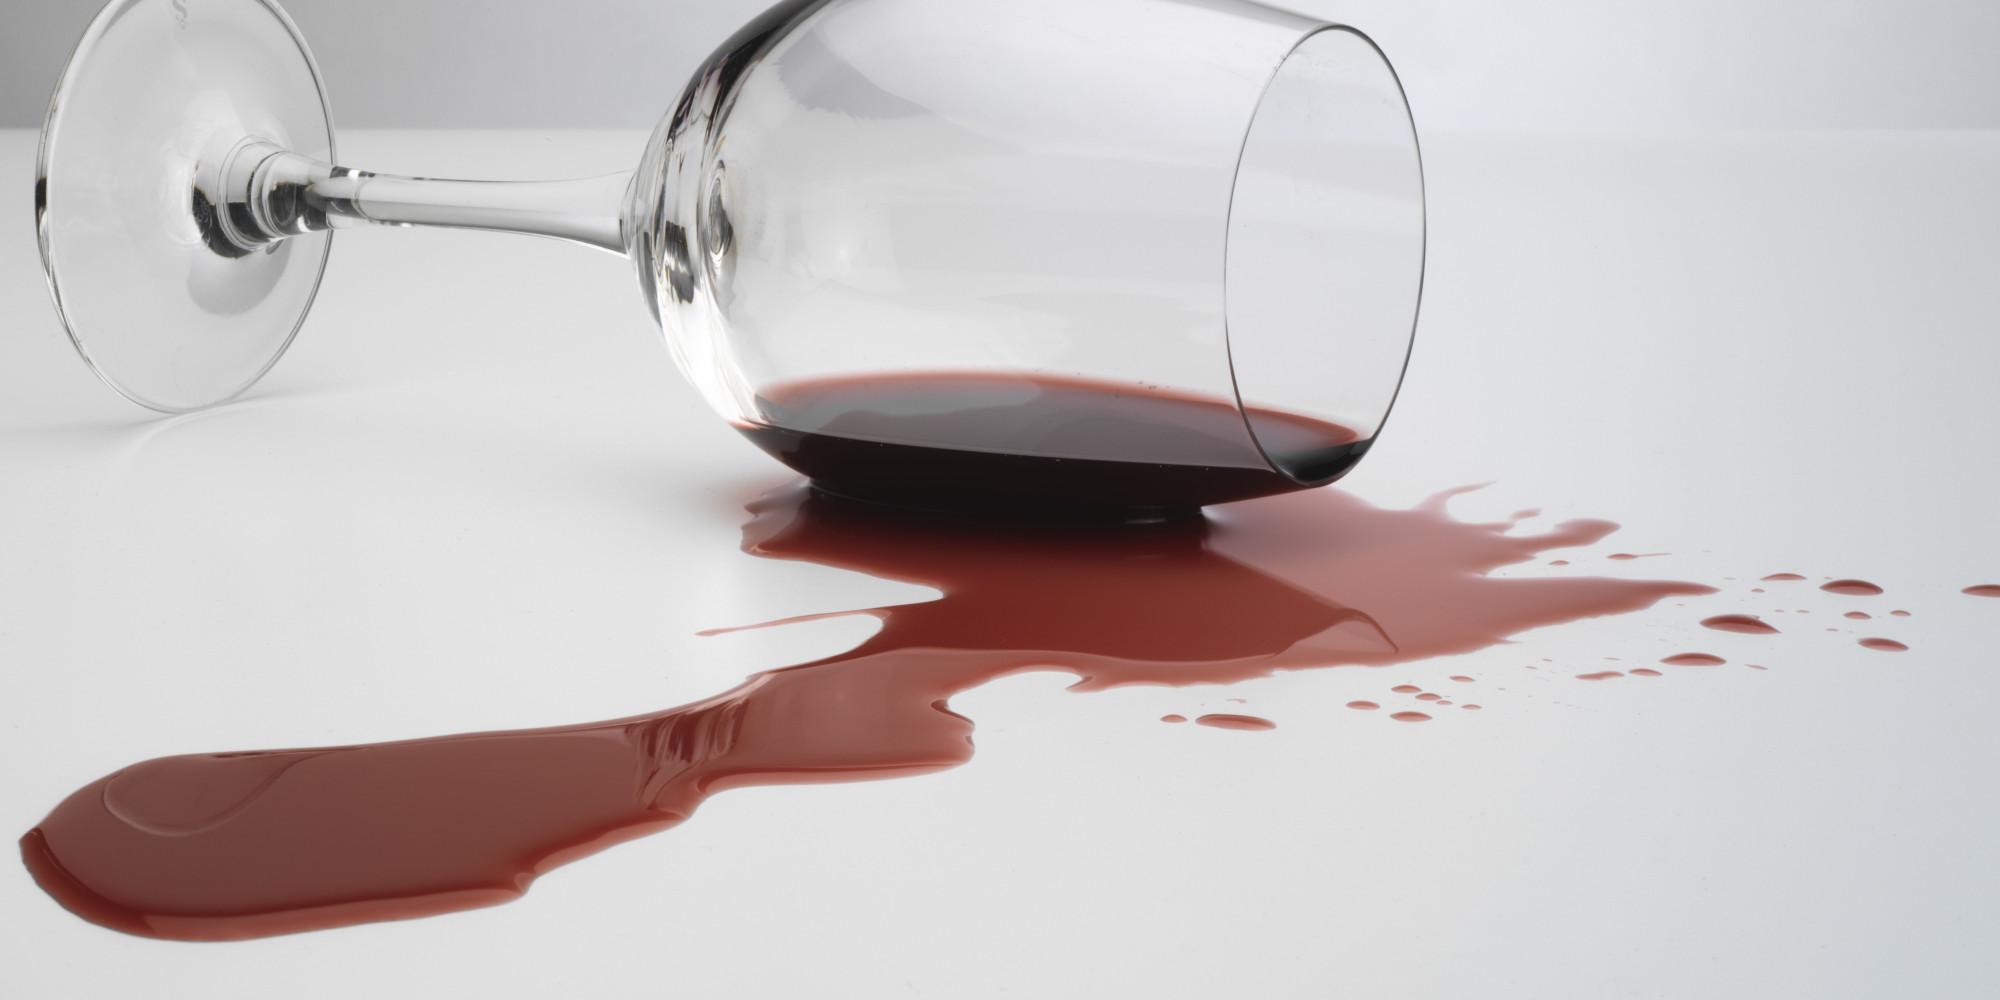 Wine Spill 011